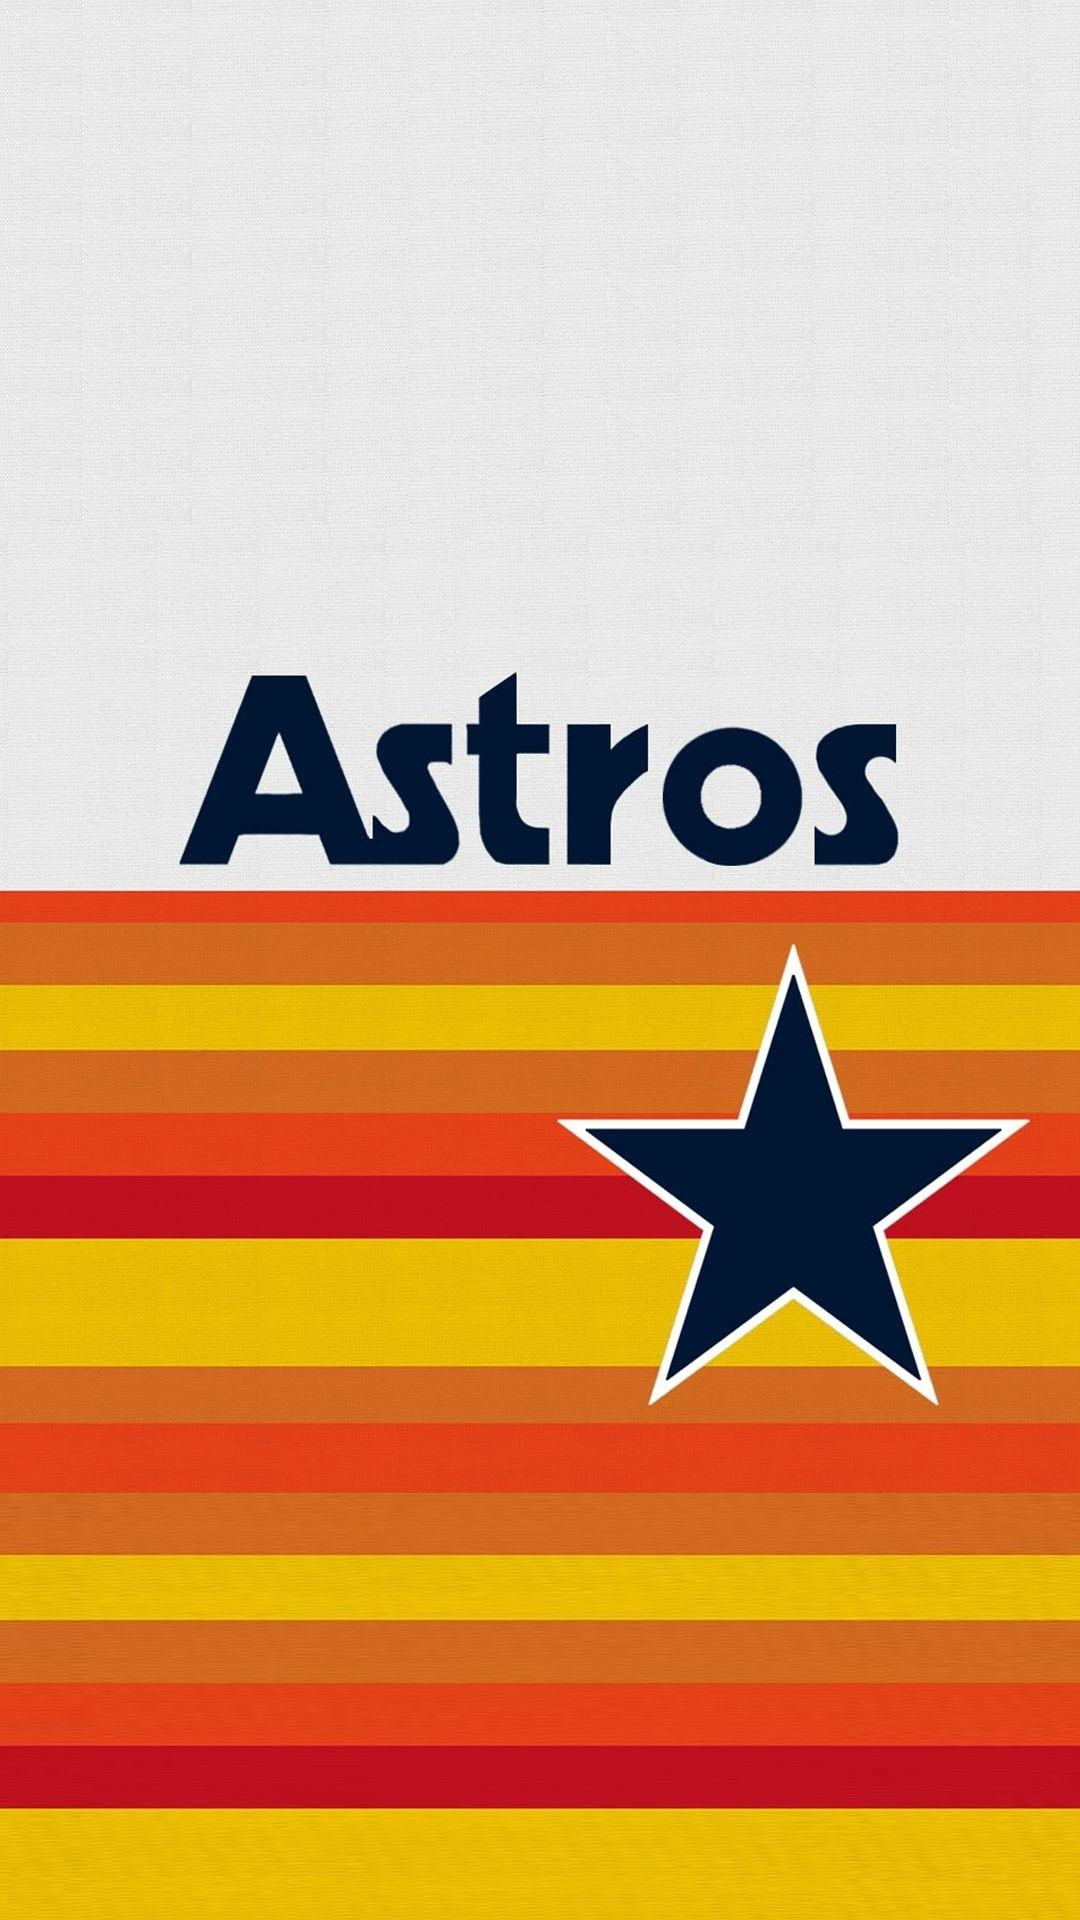 astros-wallpaper-20